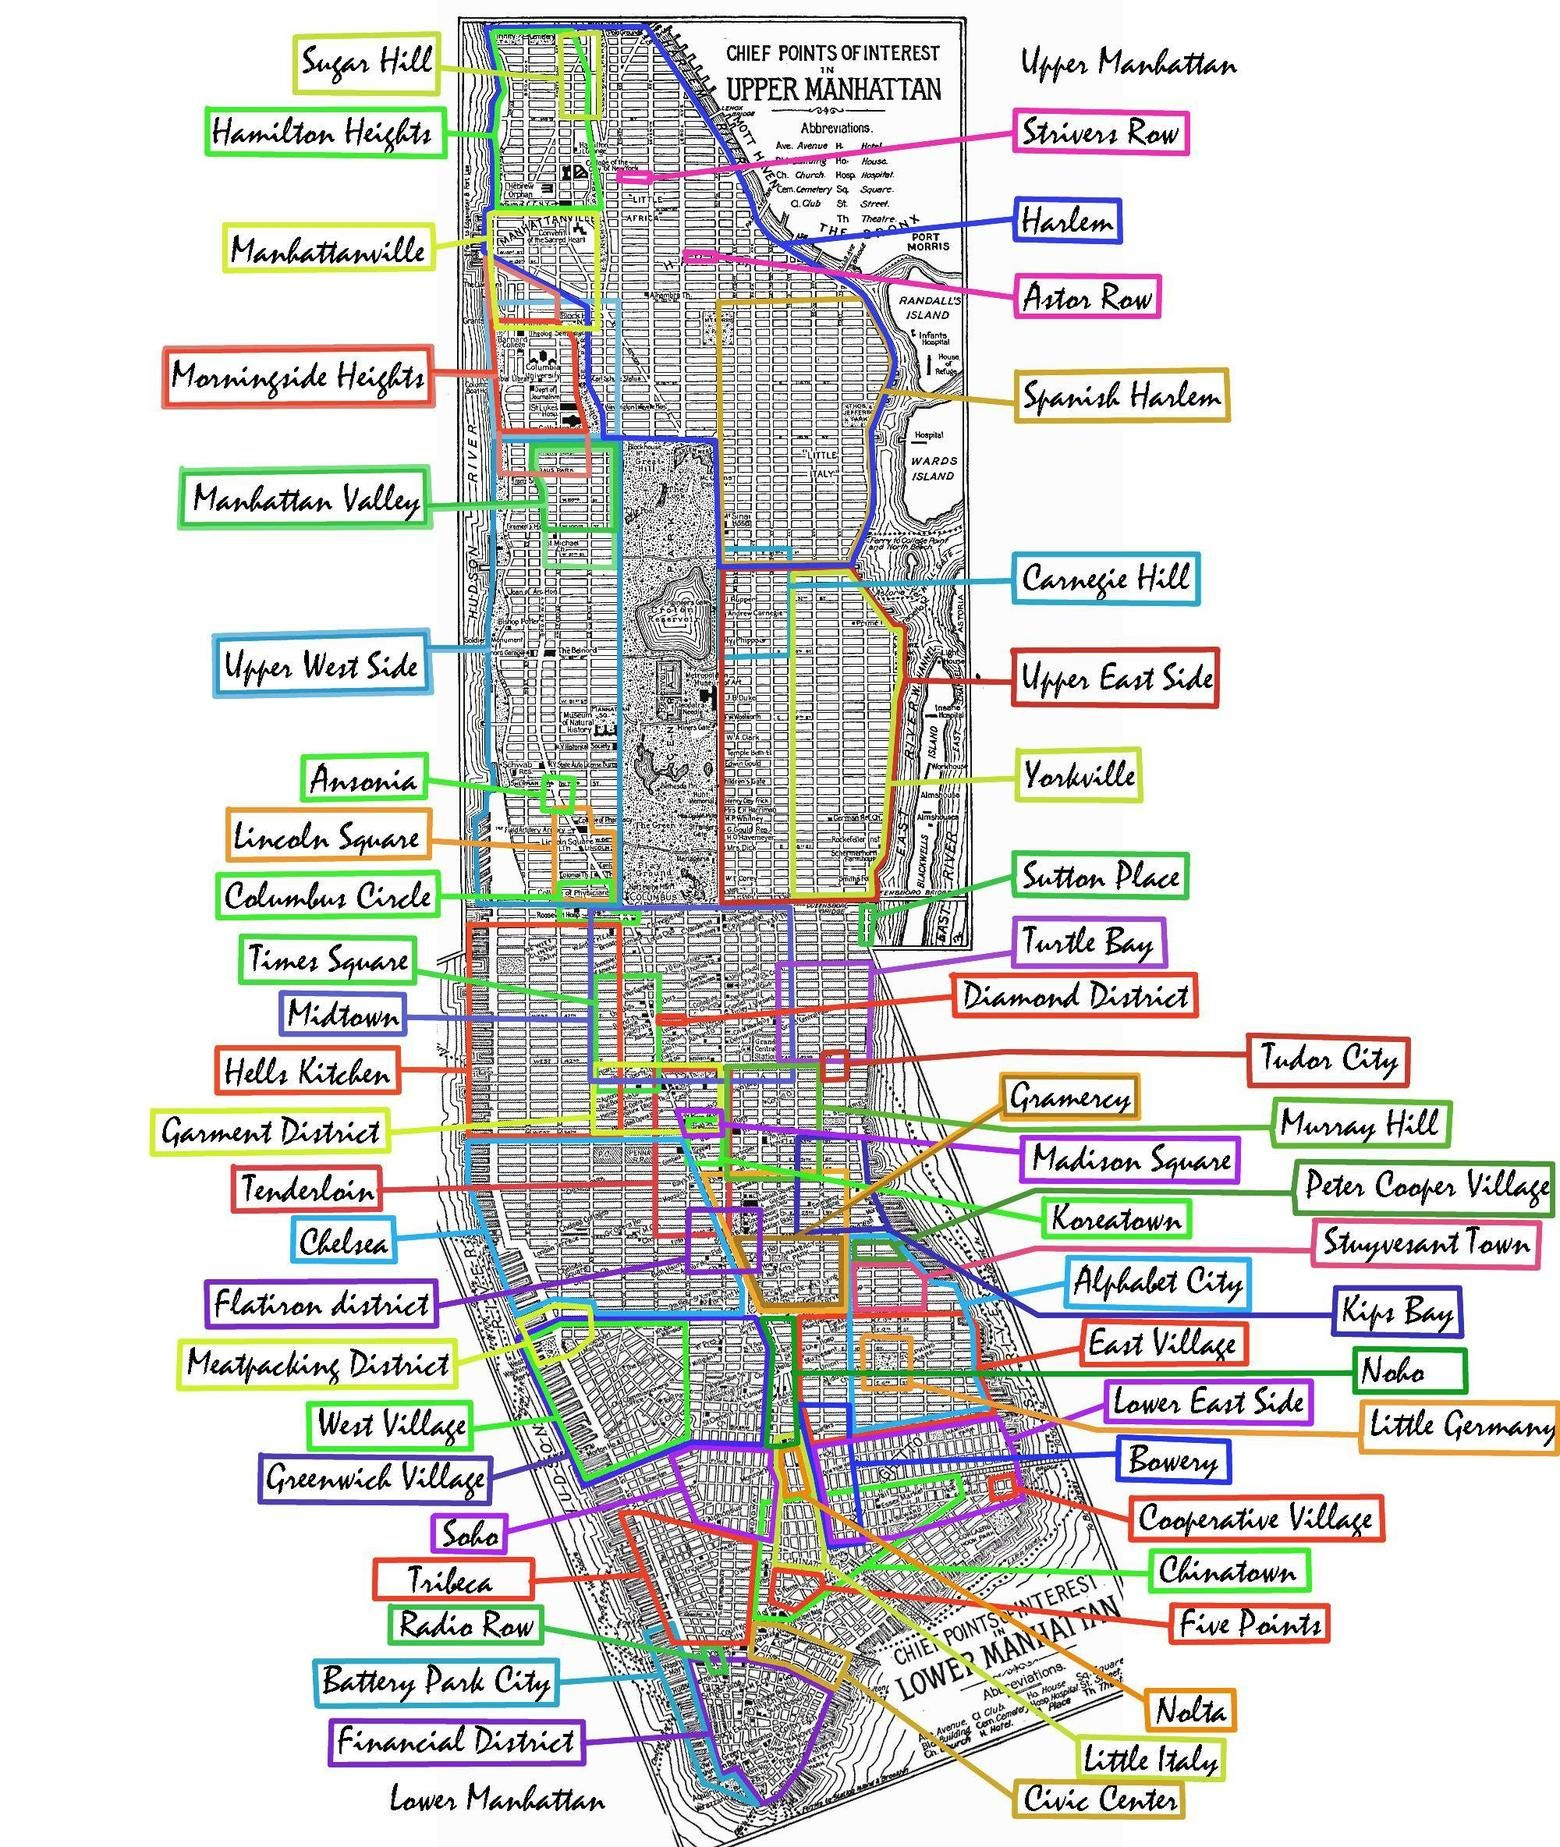 New York Subway Map Hide.Fun And Thorough But Jumbled Map Of Manhattan S Hoods 1560 X